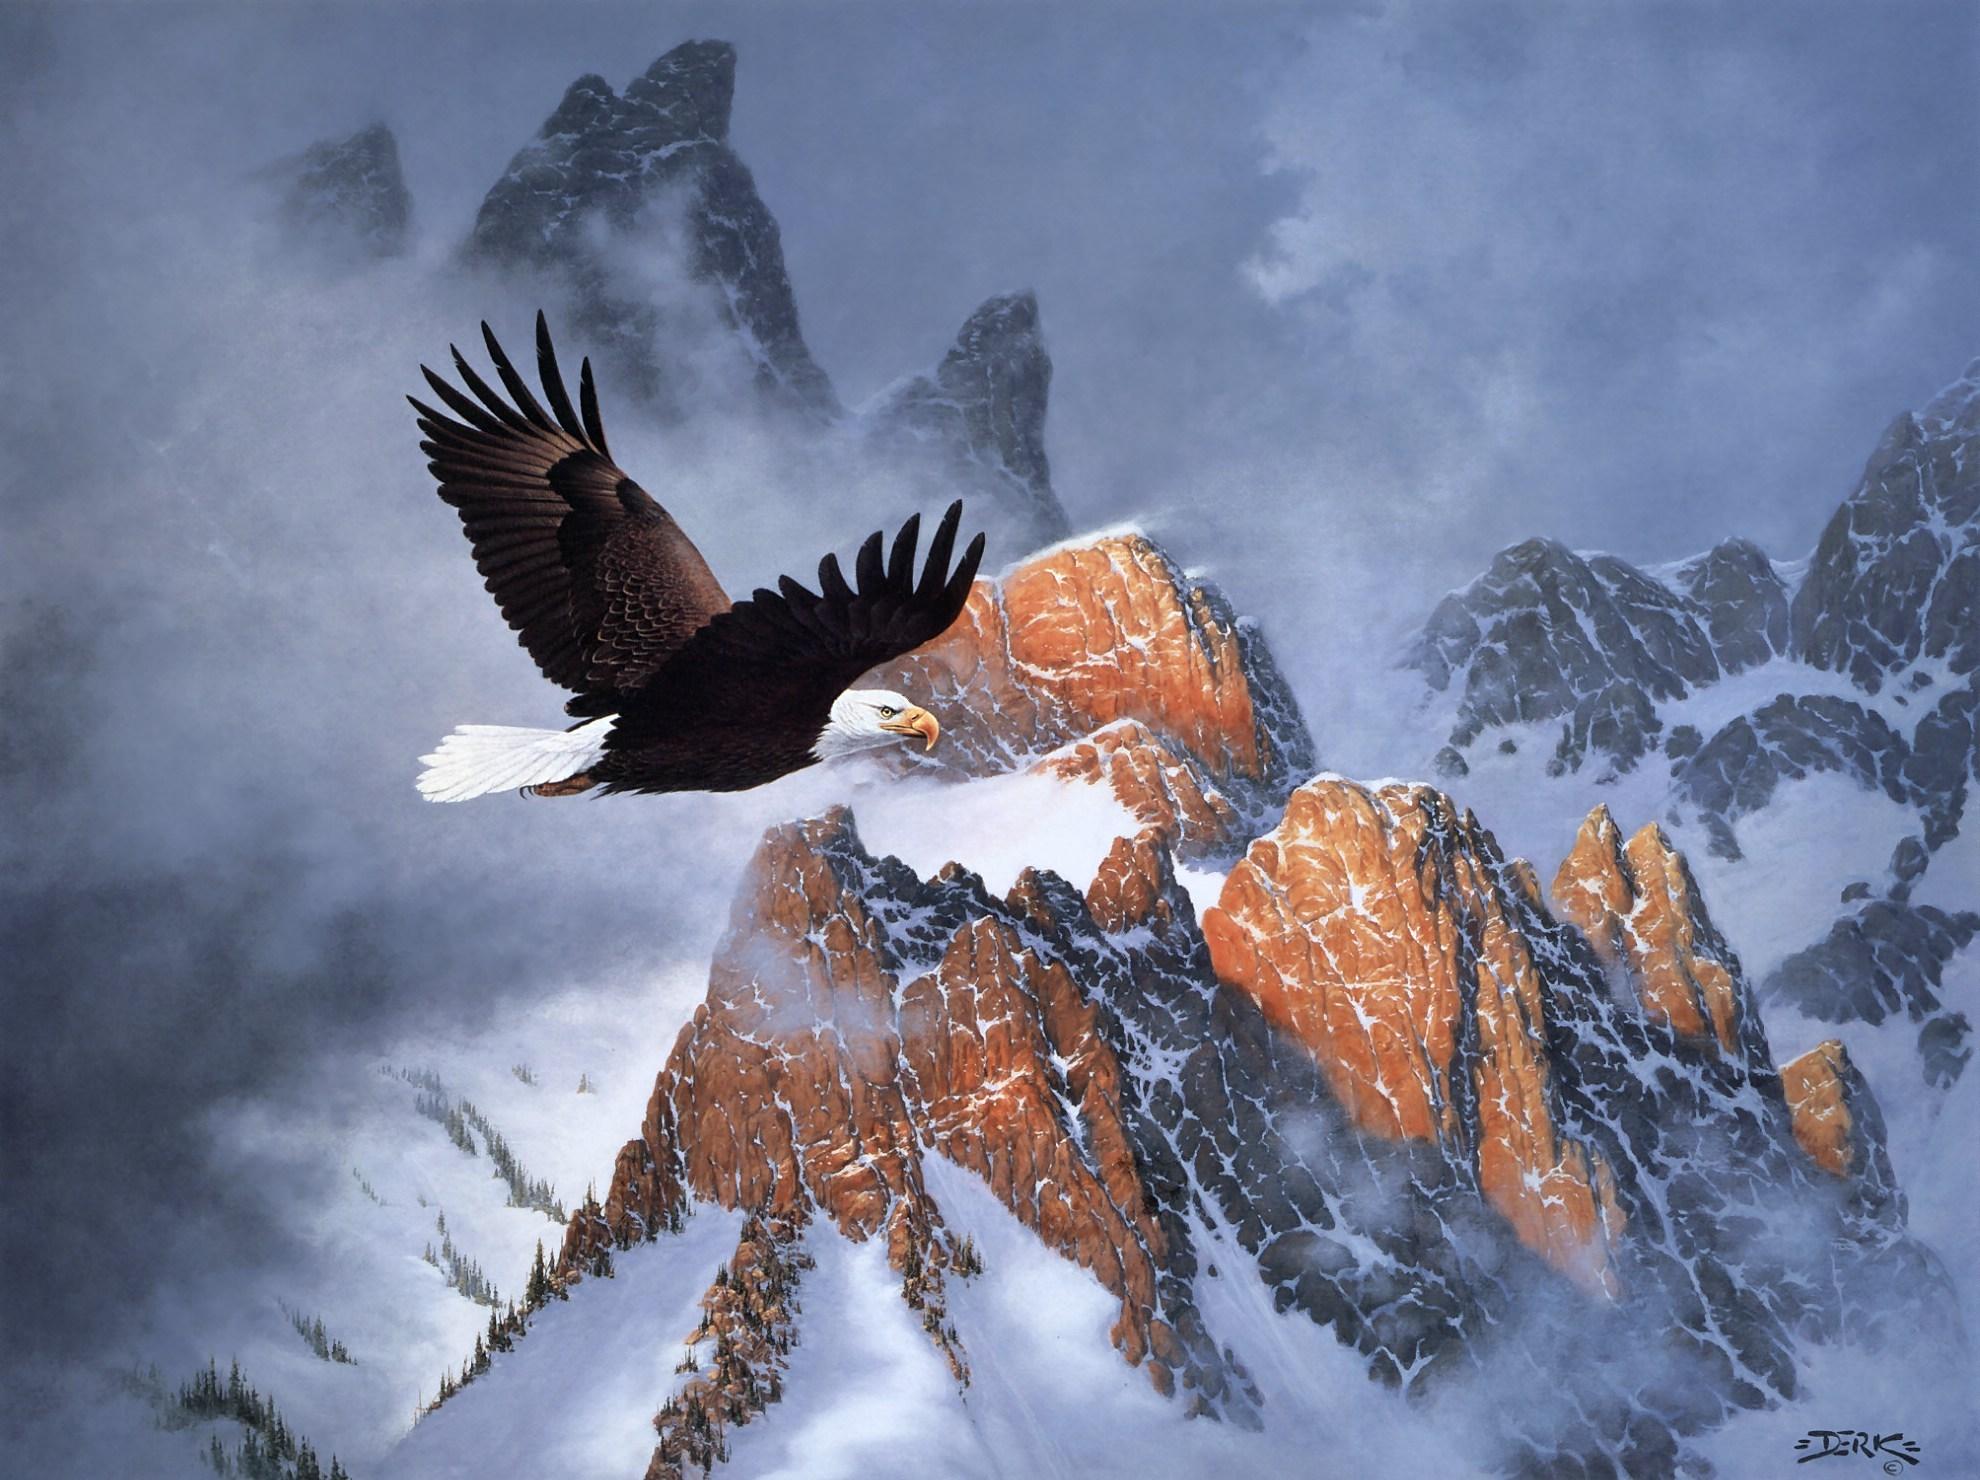 Hd wallpaper eagle - Hd Wallpaper Background Id 361507 1980x1480 Animal Bald Eagle